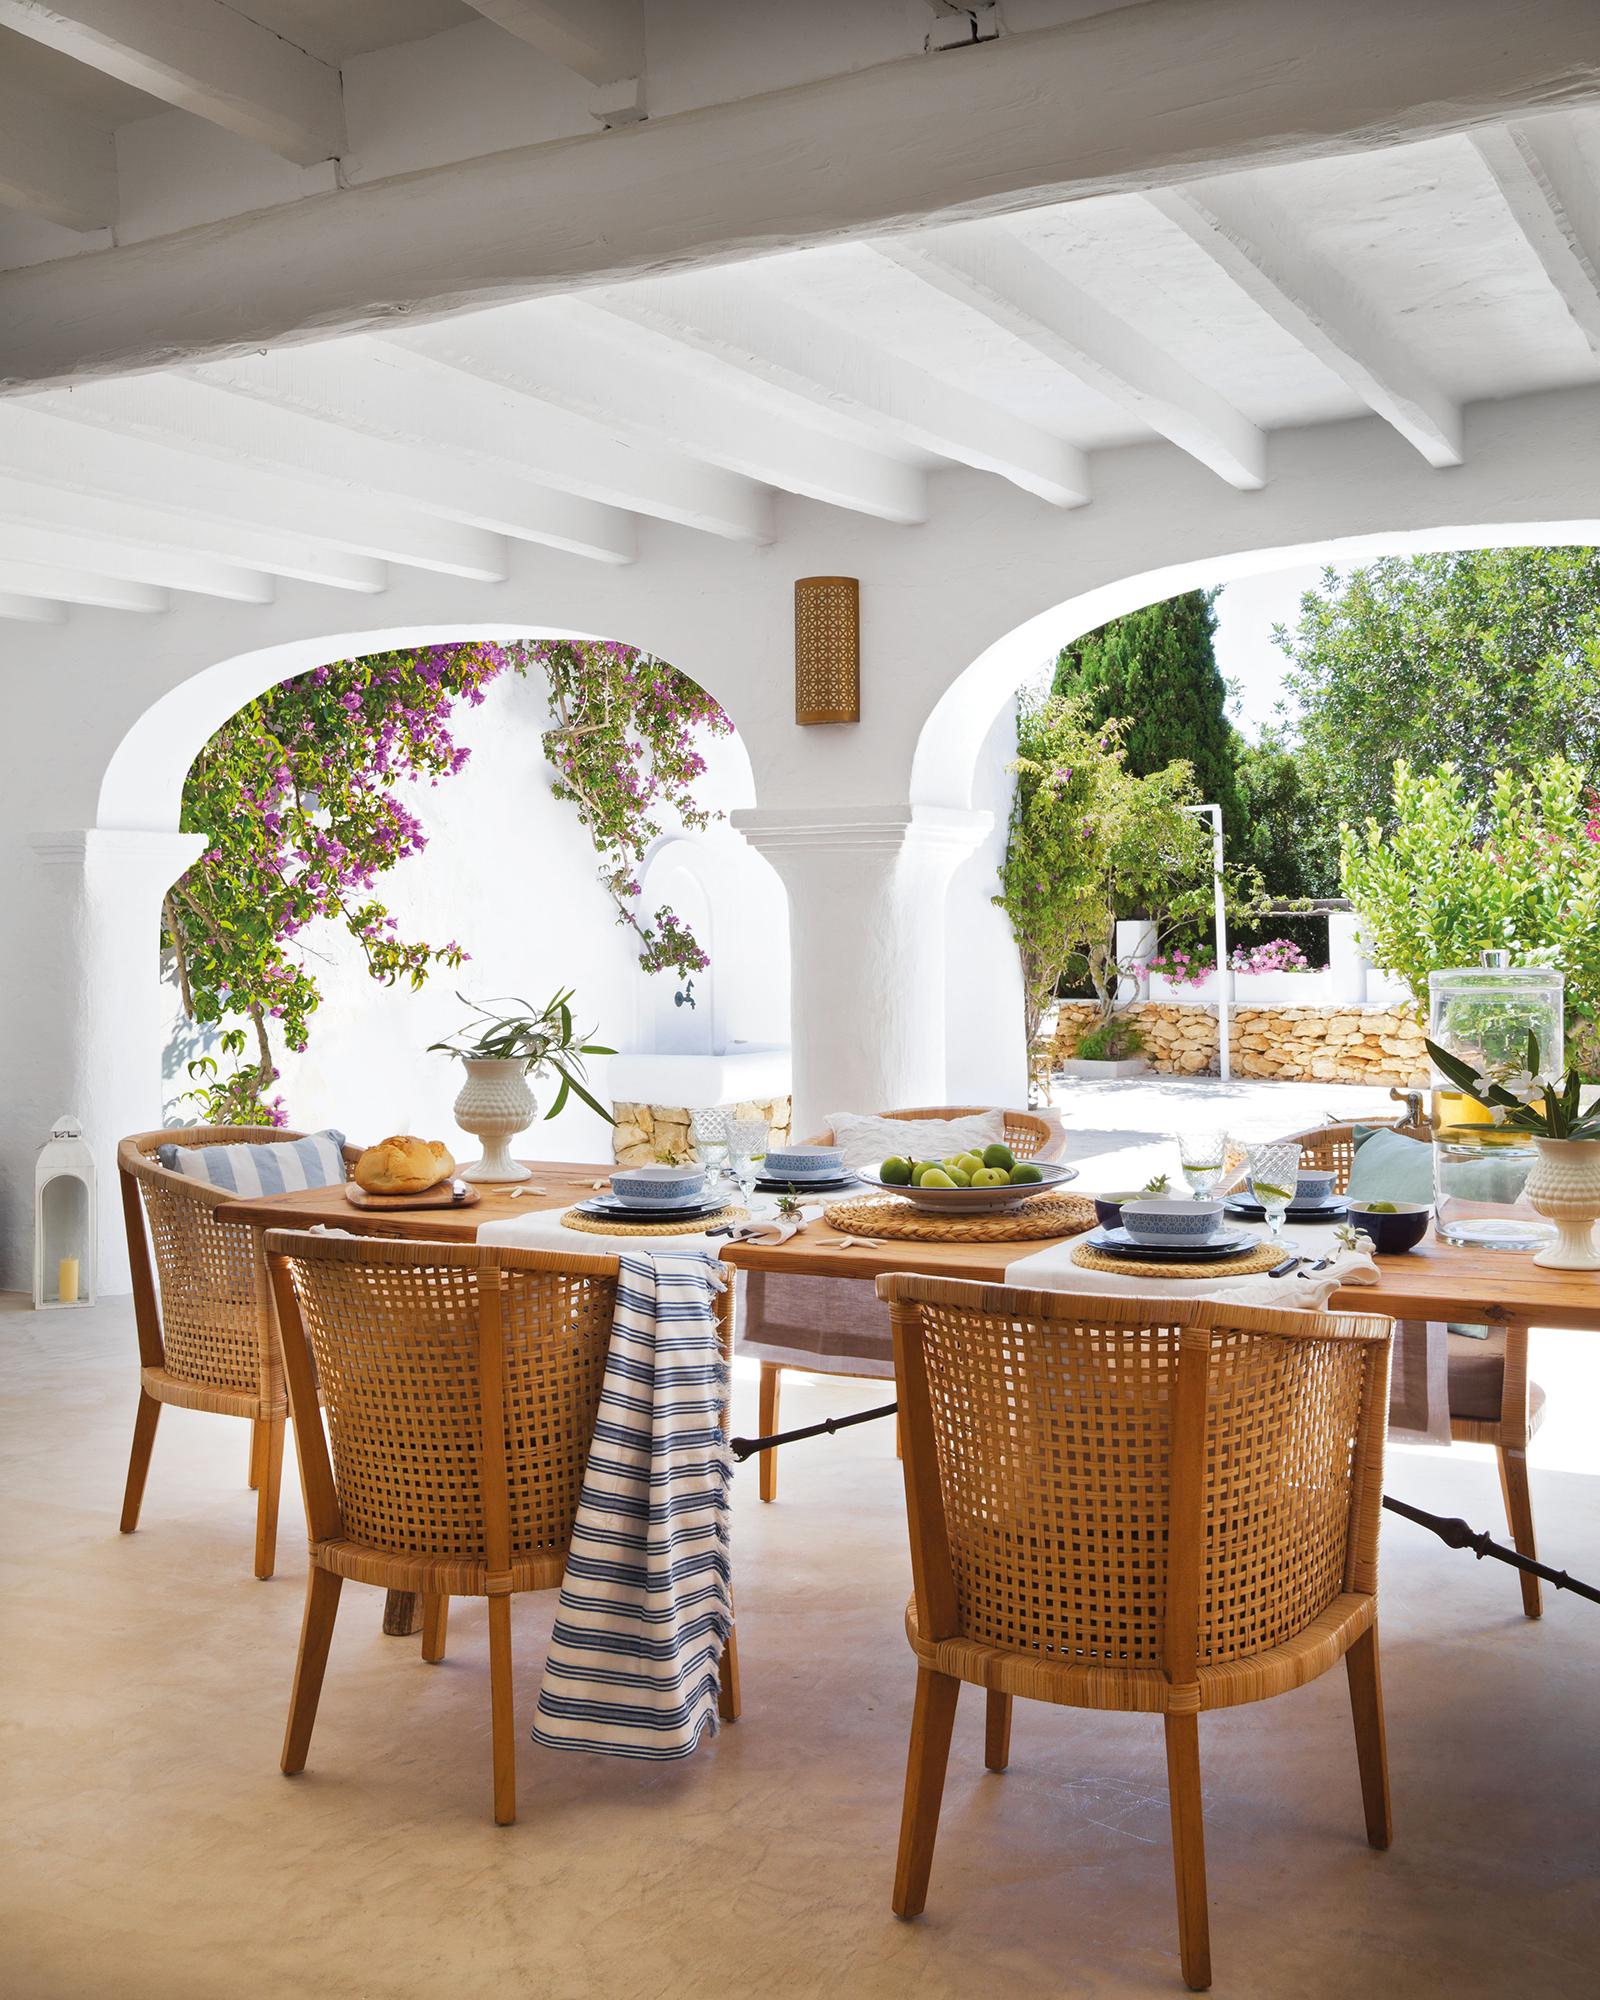 Porche porches de madera modernos o r sticos elmueble for Mesa porche